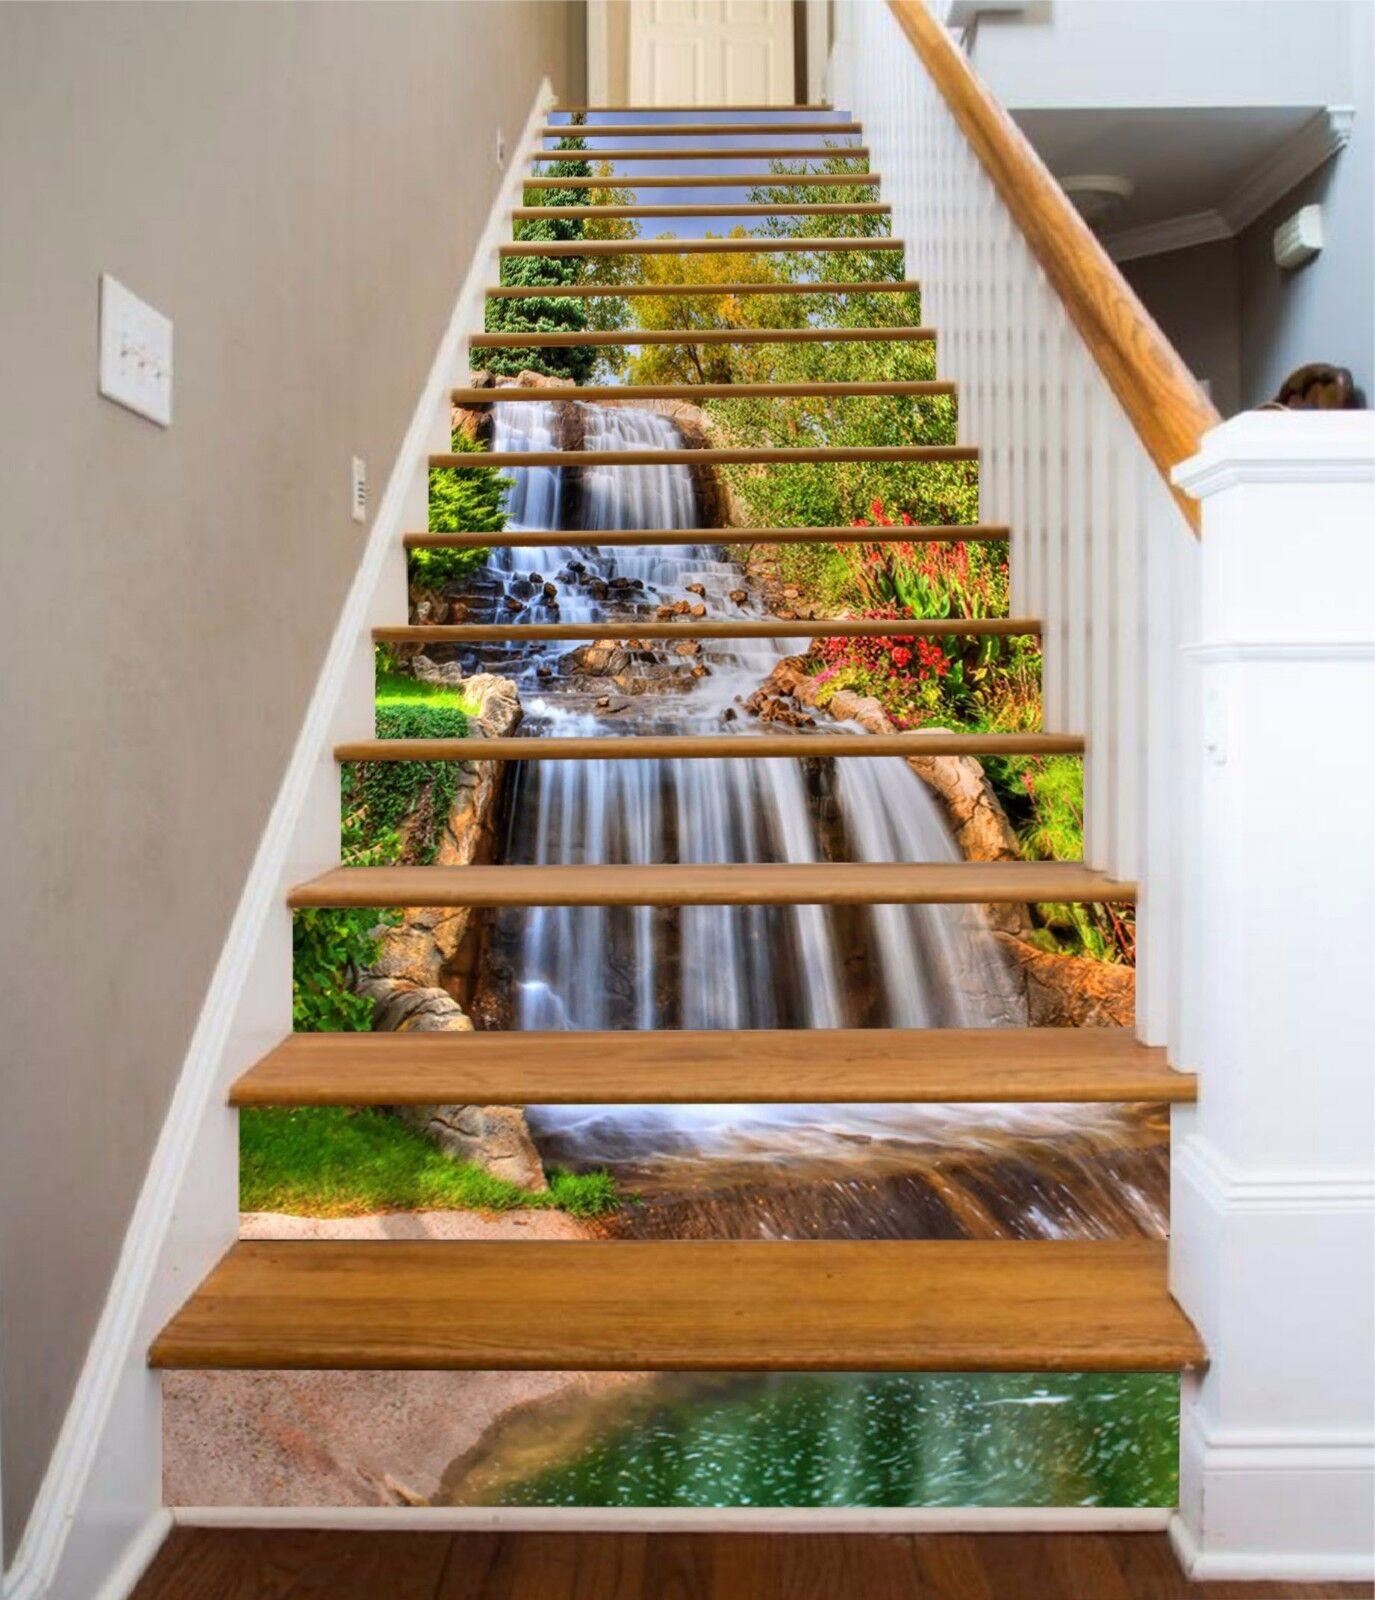 3D Sault Grove 617 Stair Risers Decoration Photo Mural Vinyl Decal Wallpaper UK